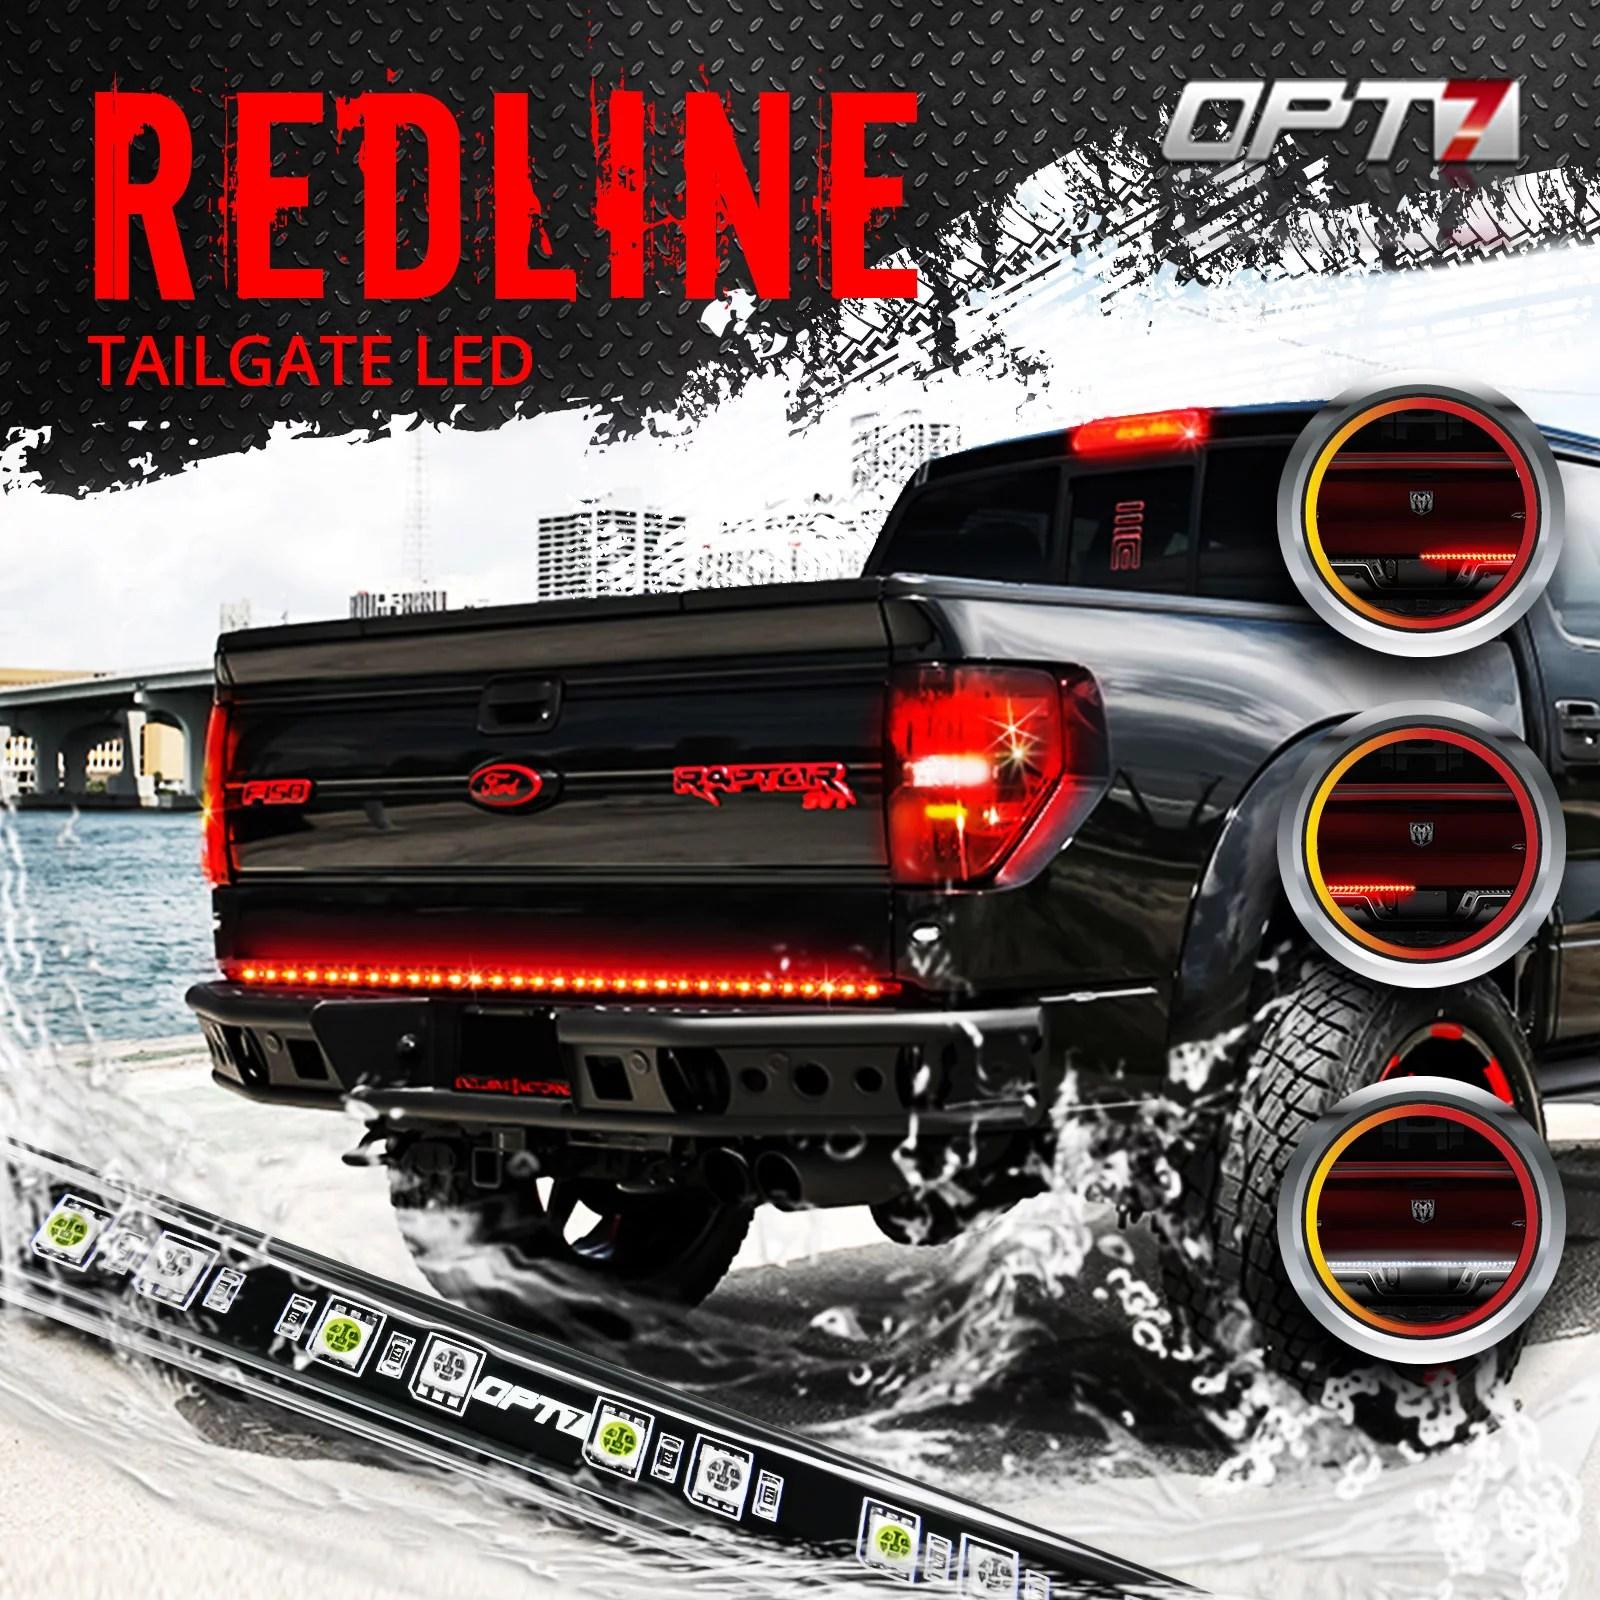 small resolution of 60 redline led tailgate light bar tri core led weatherproof led light circuit diagram opt 7 led light bar wiring diagram for truck